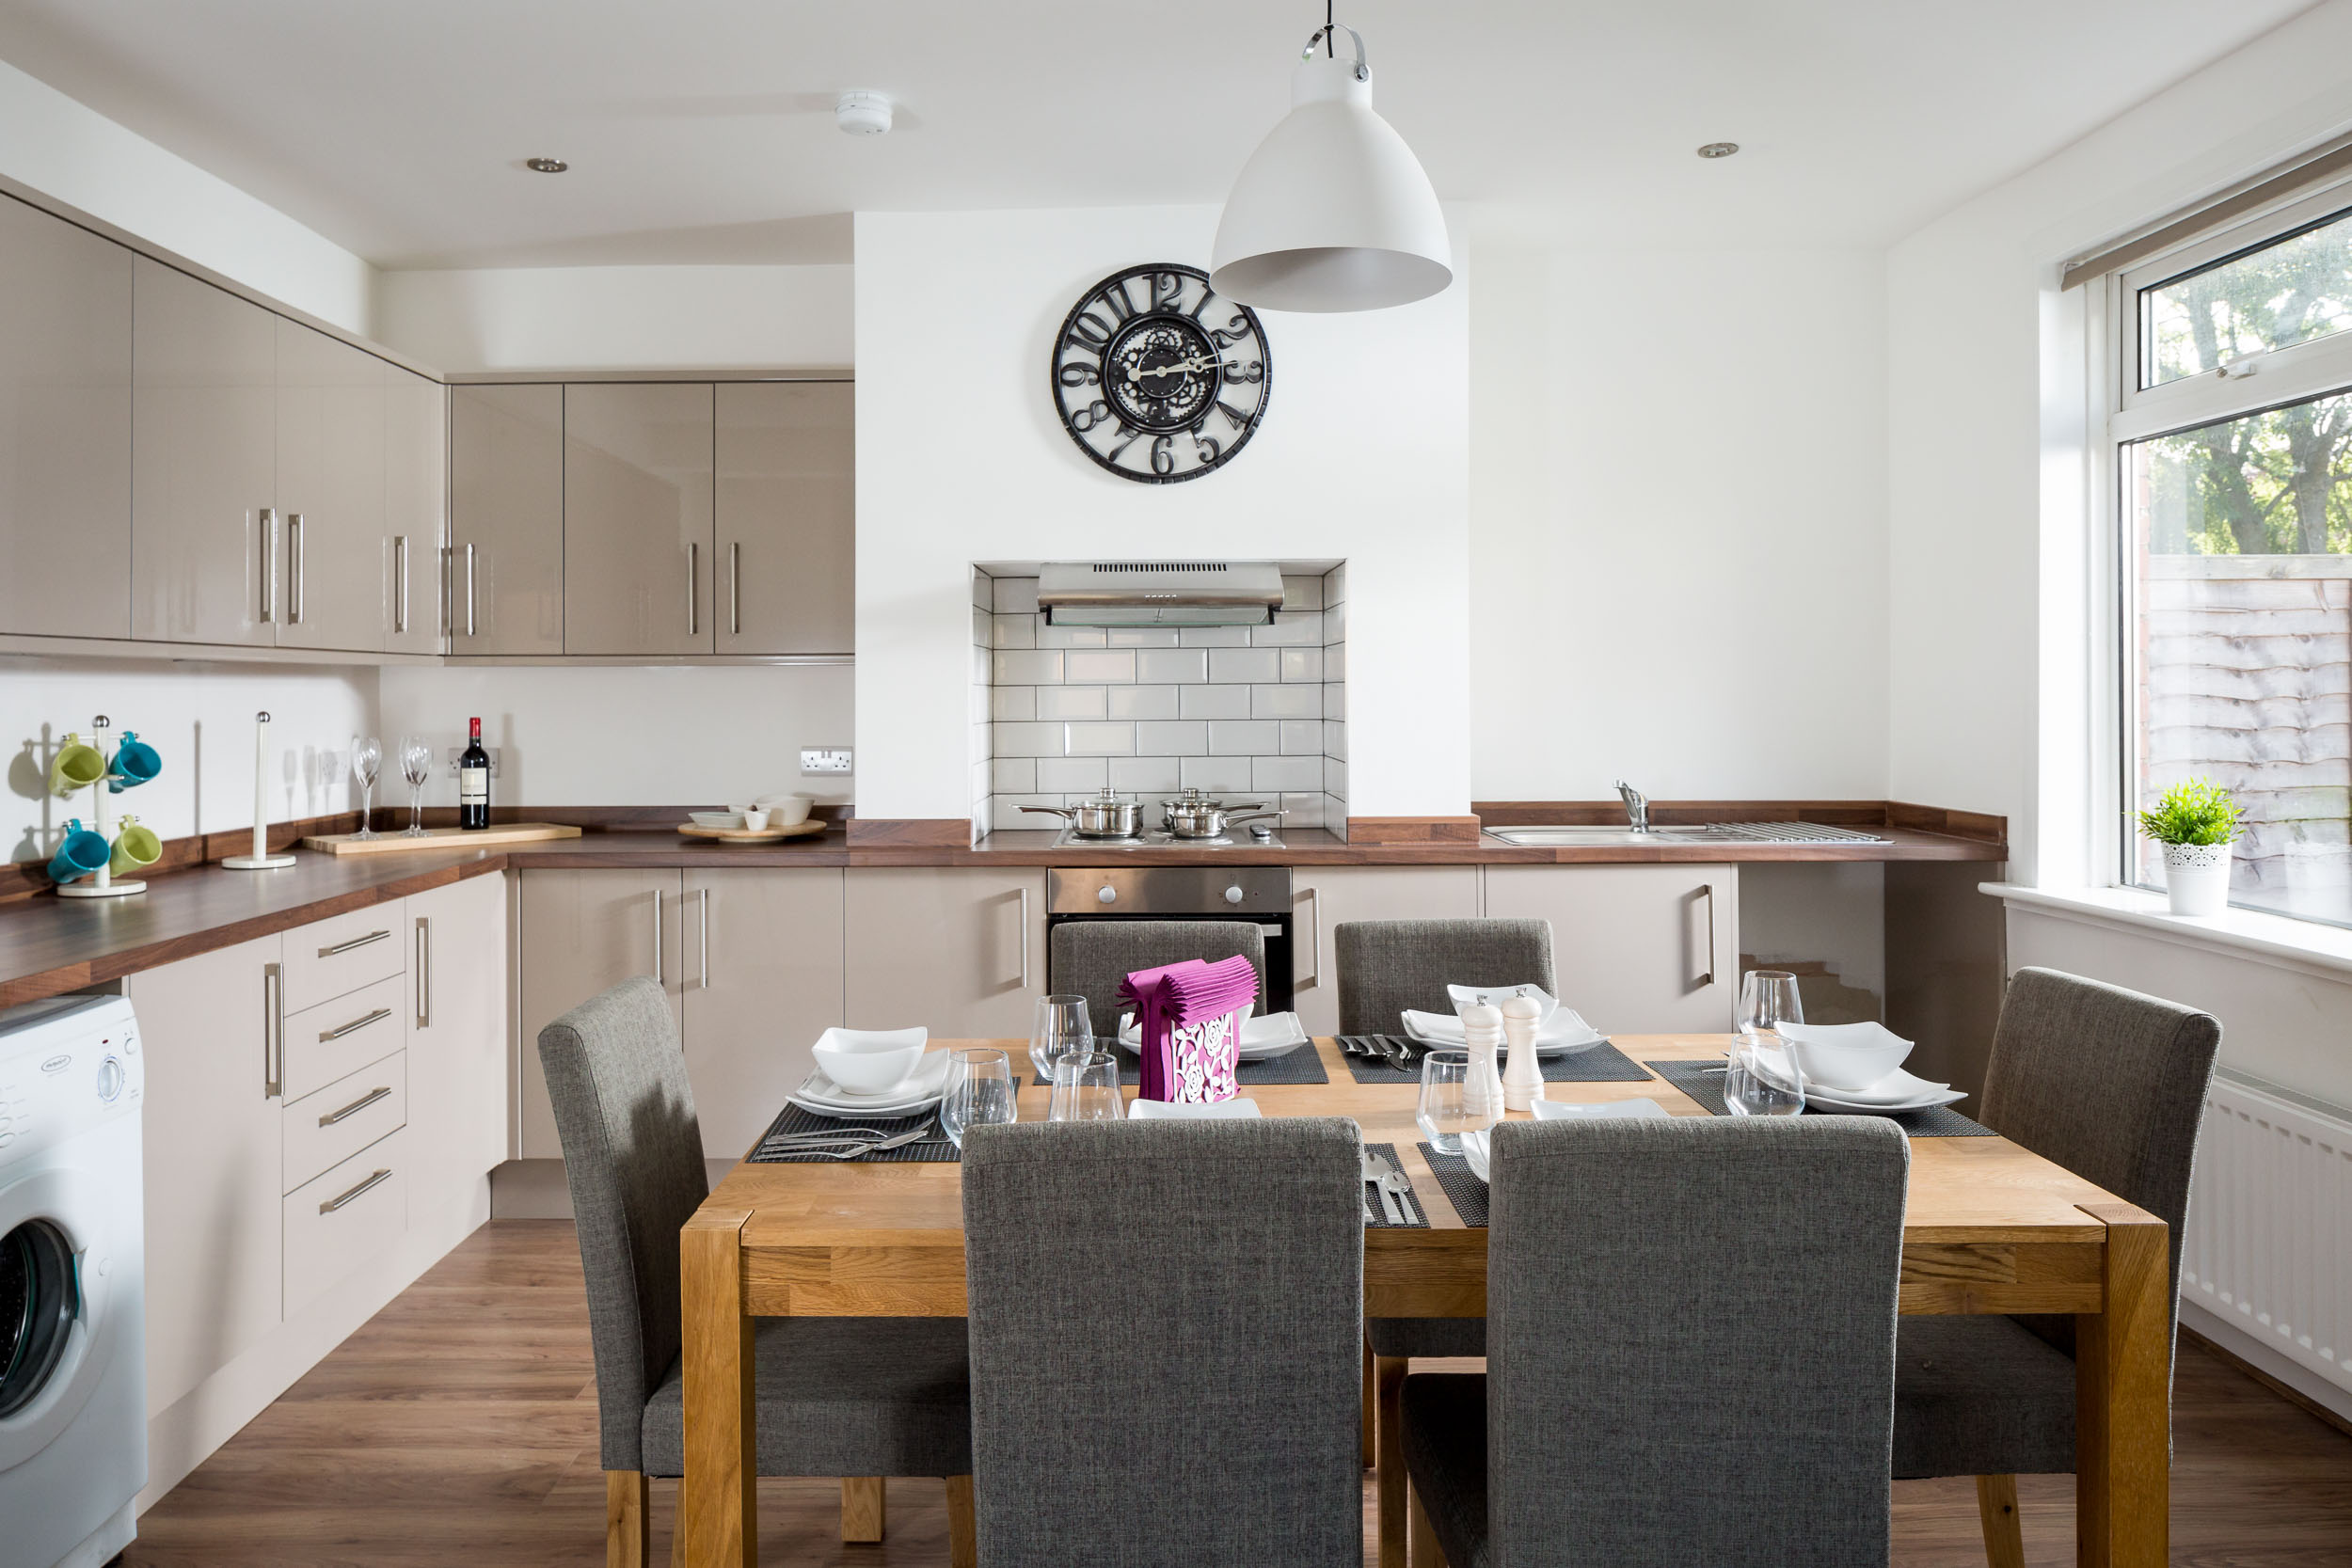 halder kitchen leeds contemporary interior property residential.jpg